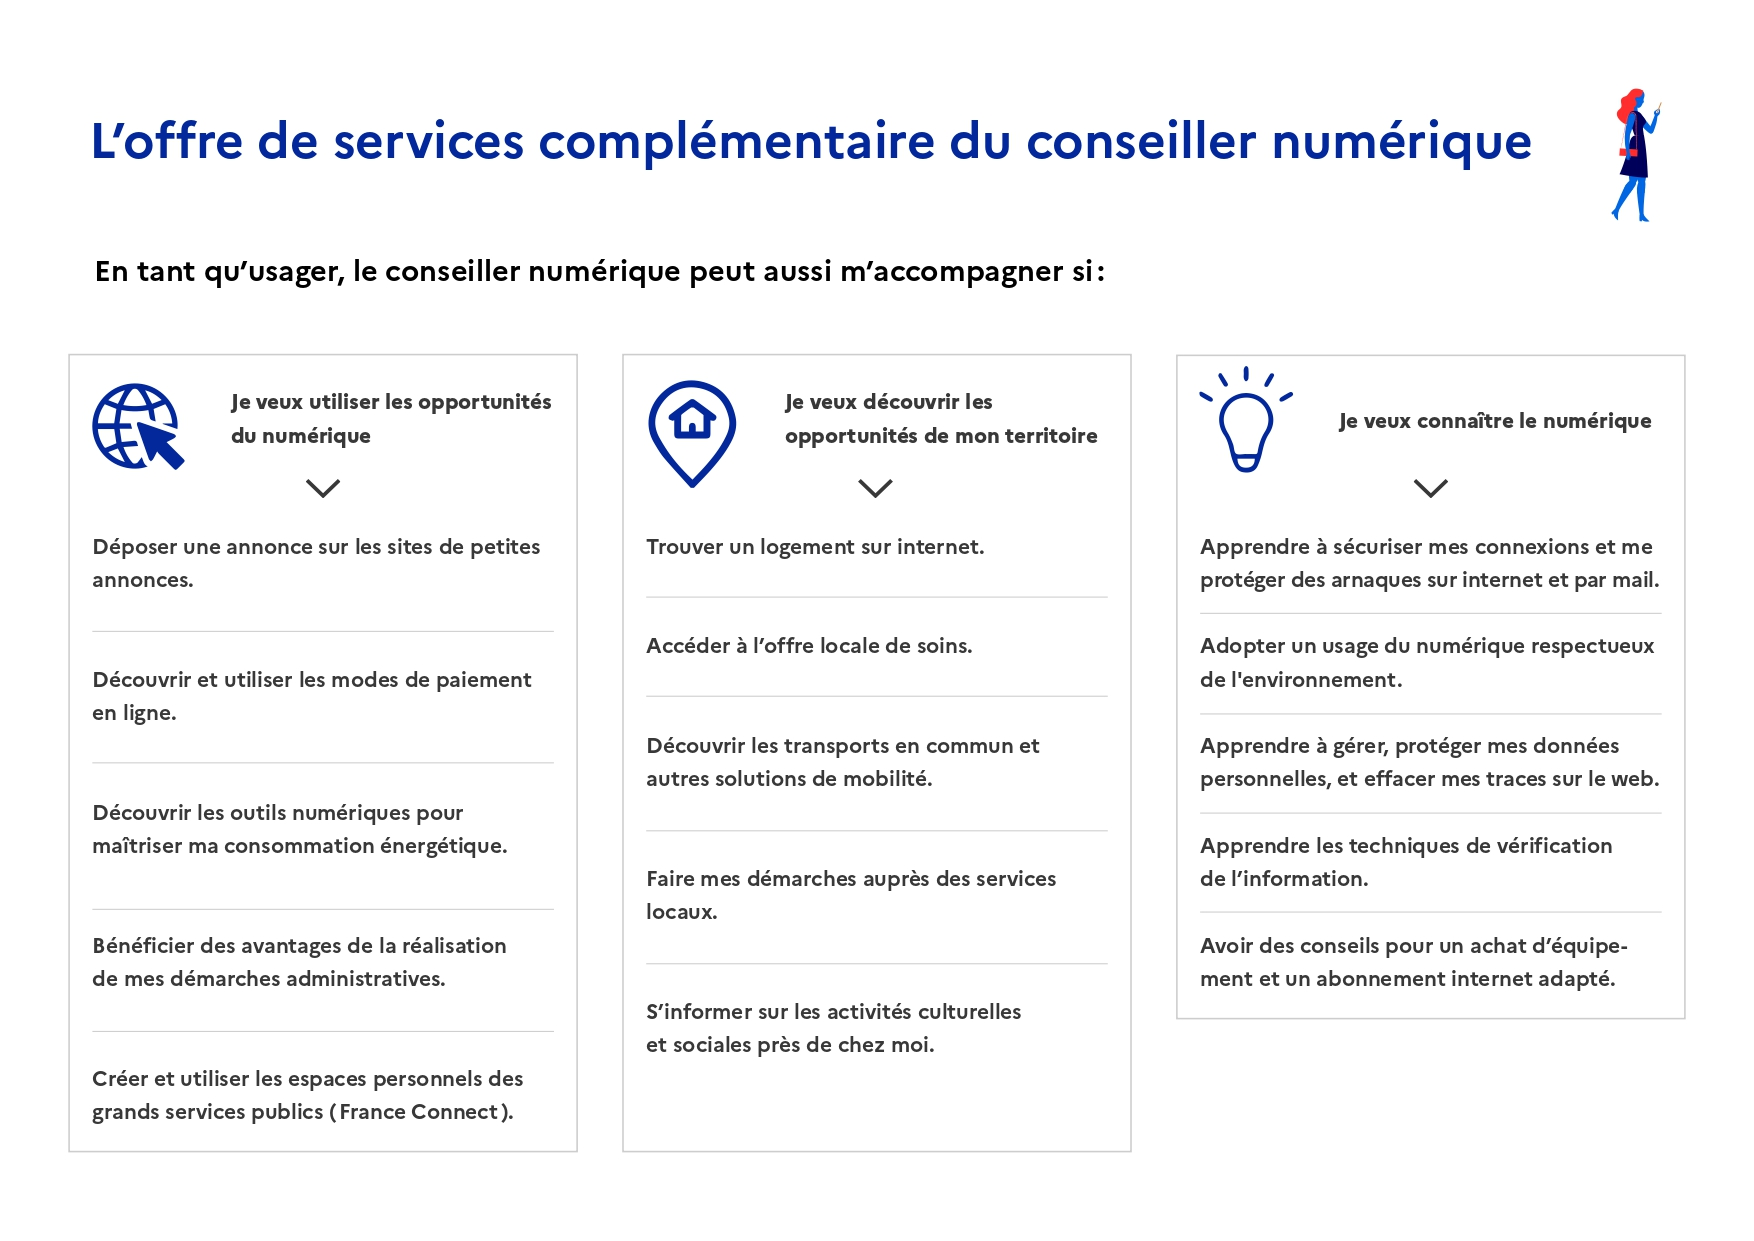 presentation-conseiller-numerique_page-0004.jpg